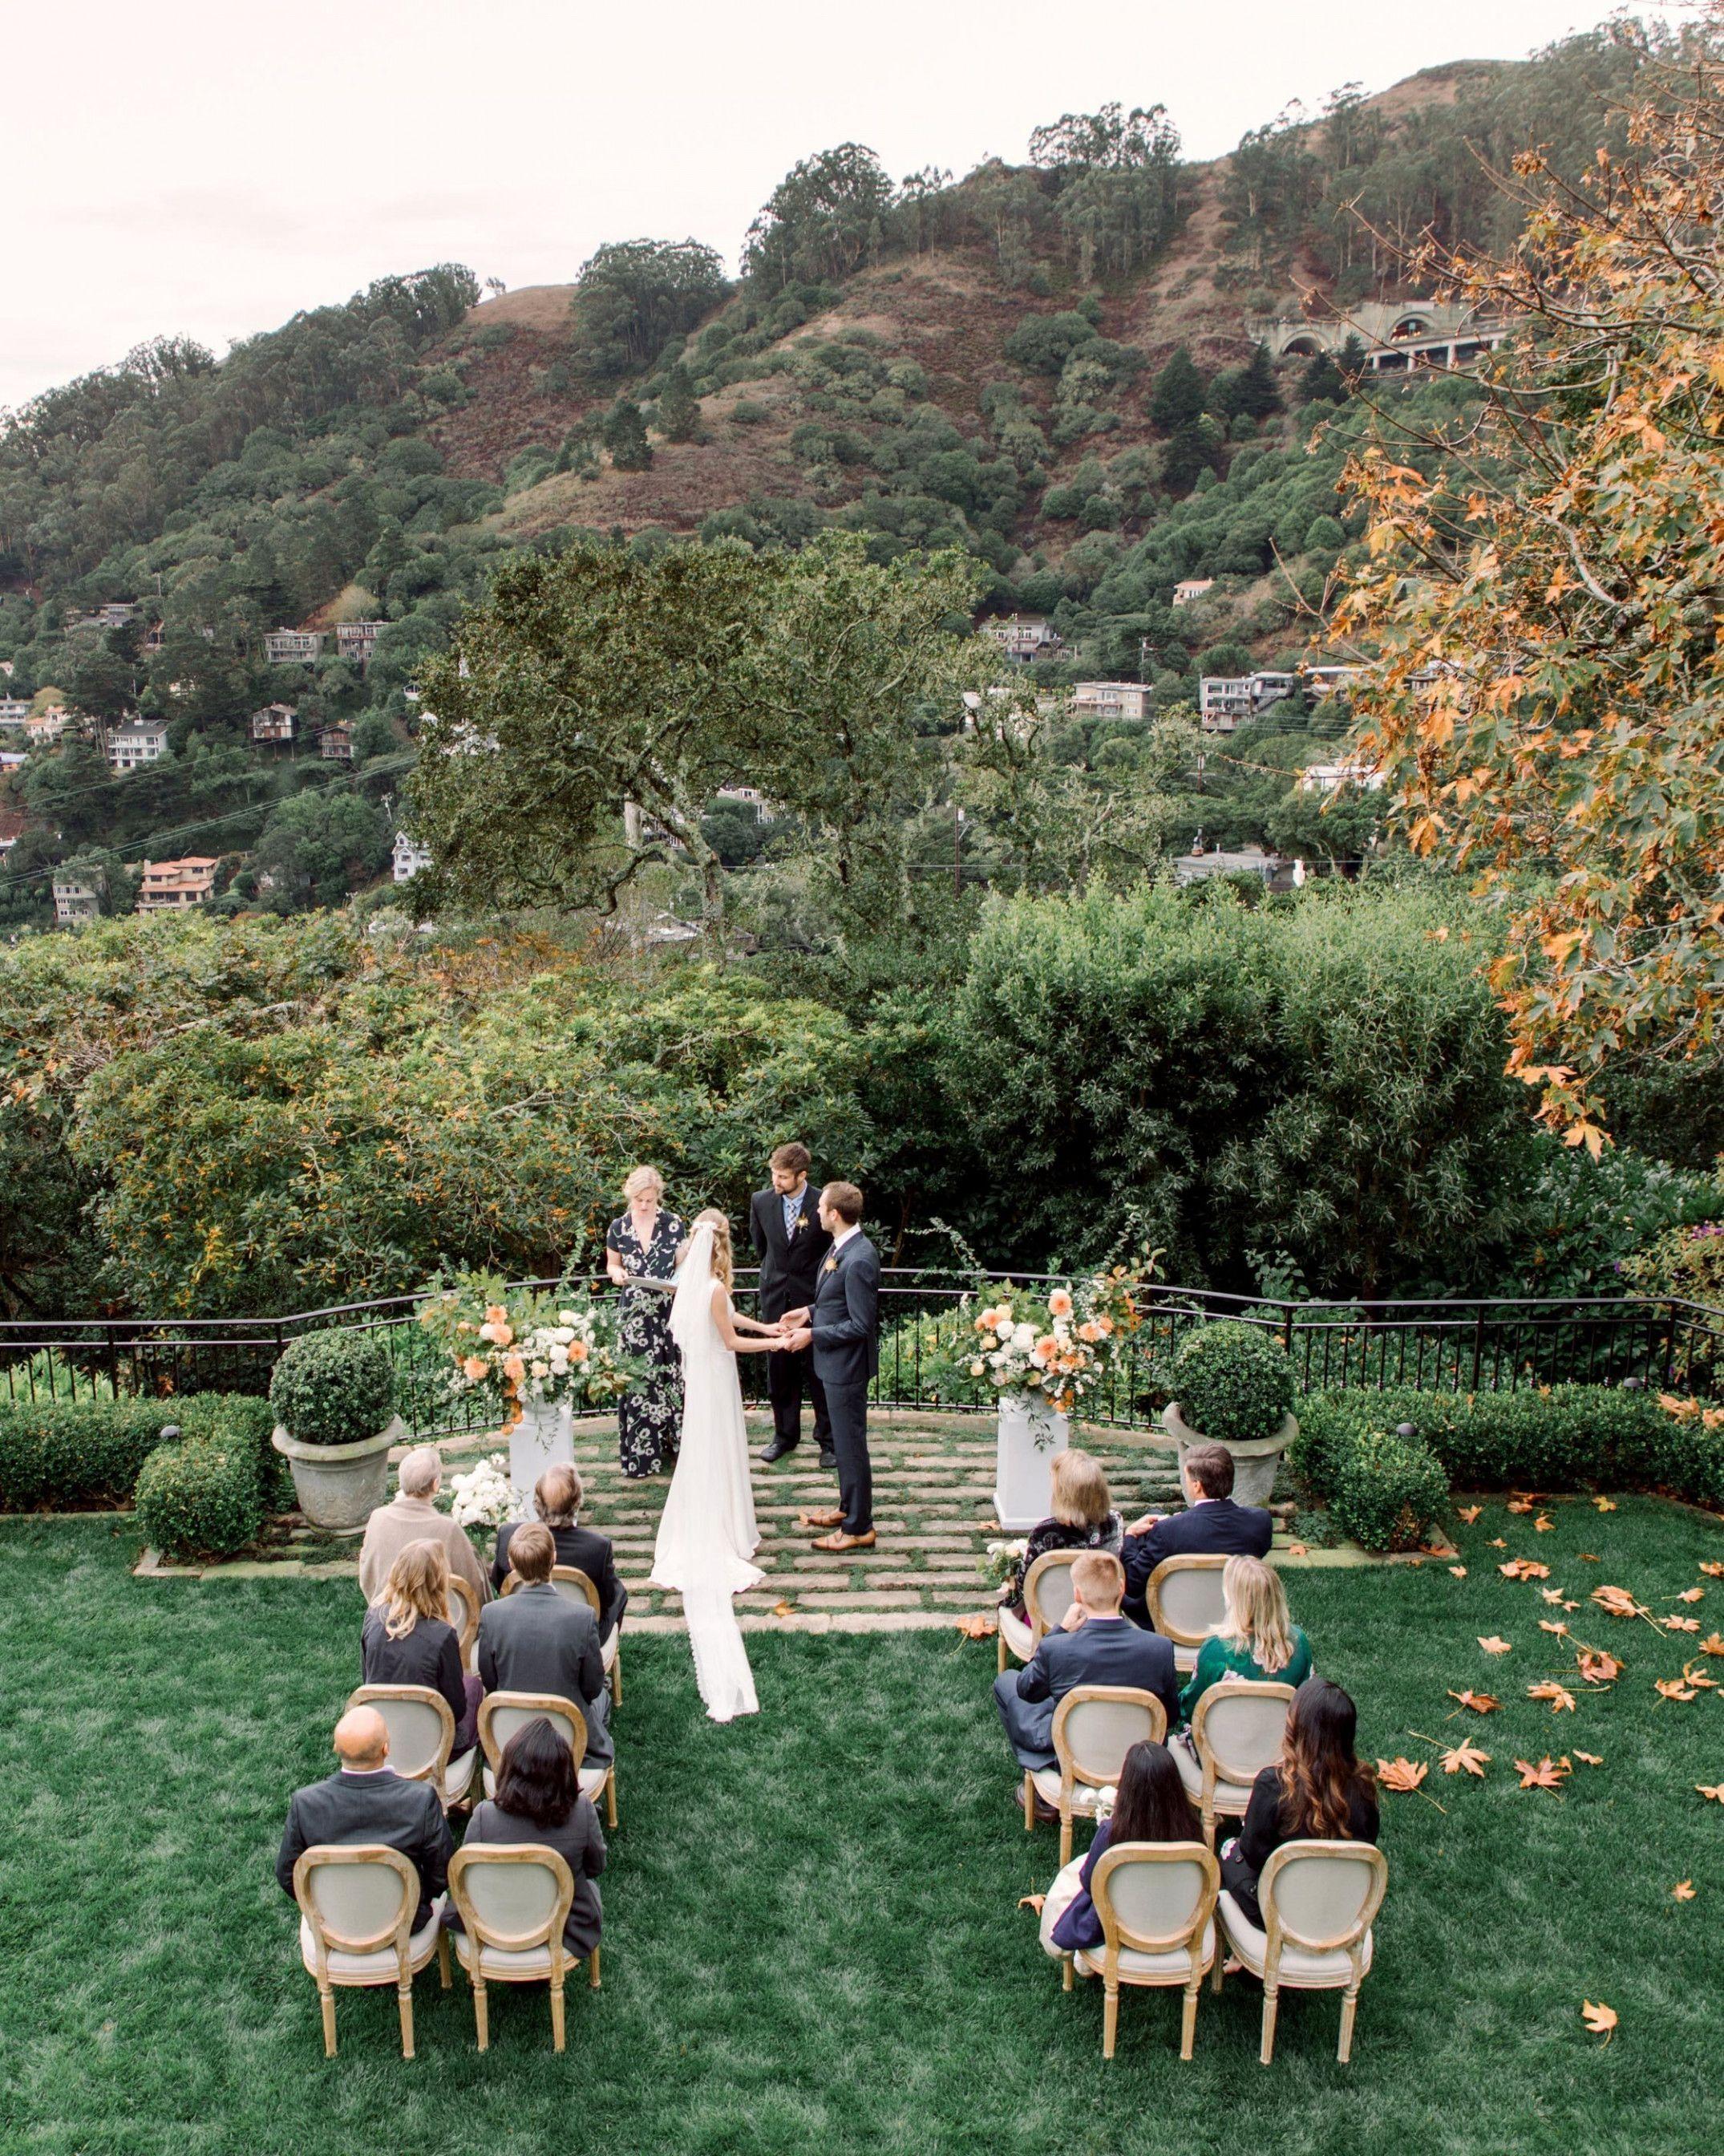 The Hidden Agenda Of Backyard Weddings Pictures The Hidden Agenda Of Backyard Weddings Pictures  The Hidden Agenda Of Backyard Weddings Pictures  backyard weddings pi Bac...